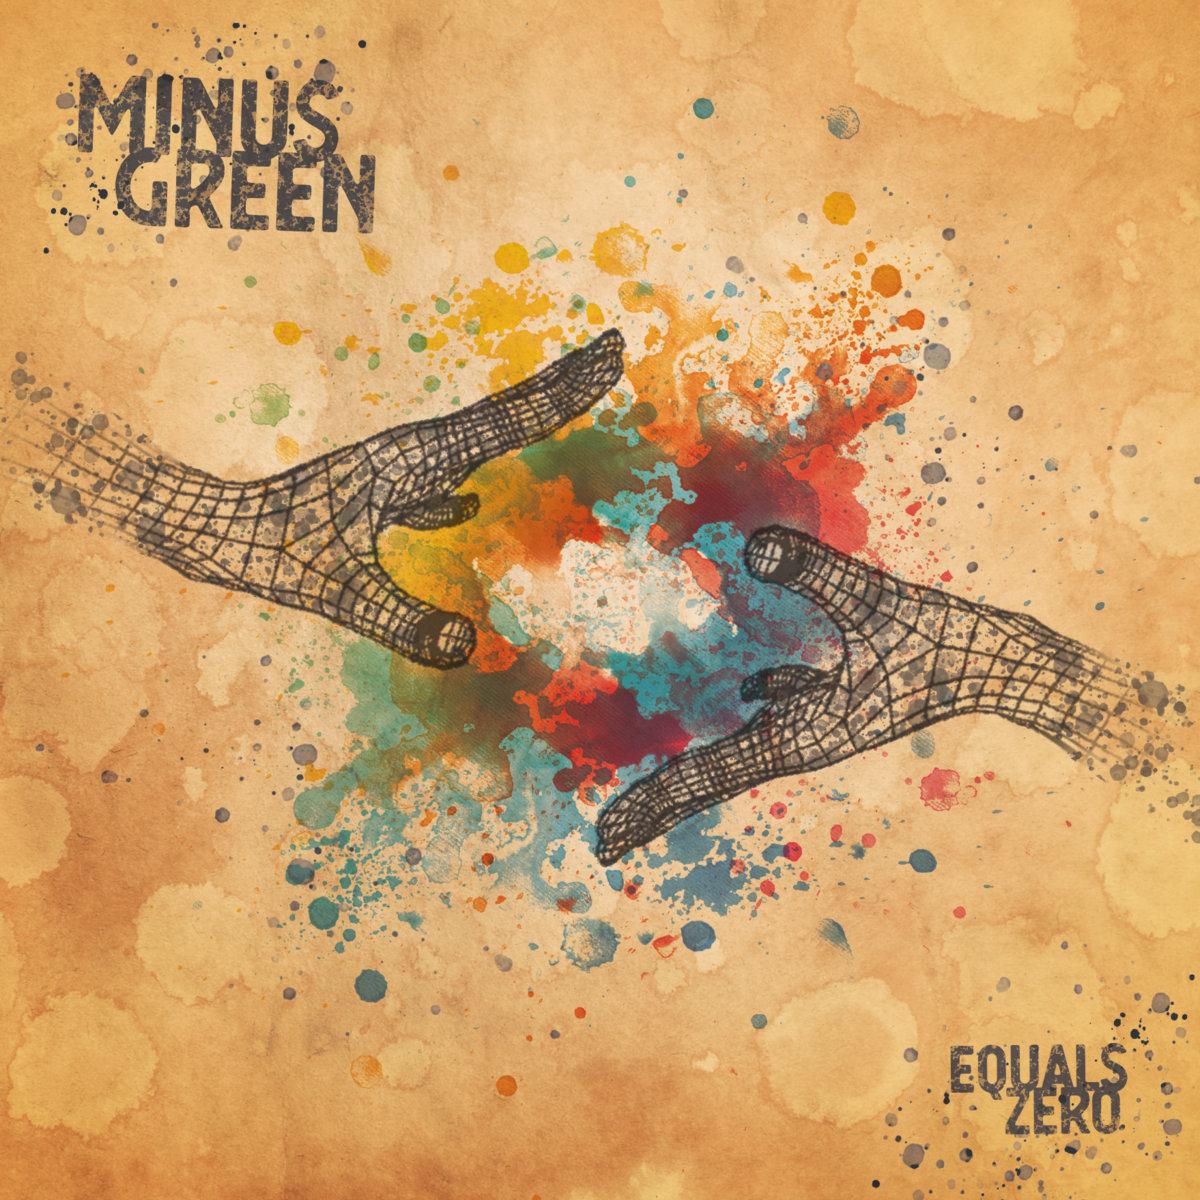 Minus Green Equals Zero